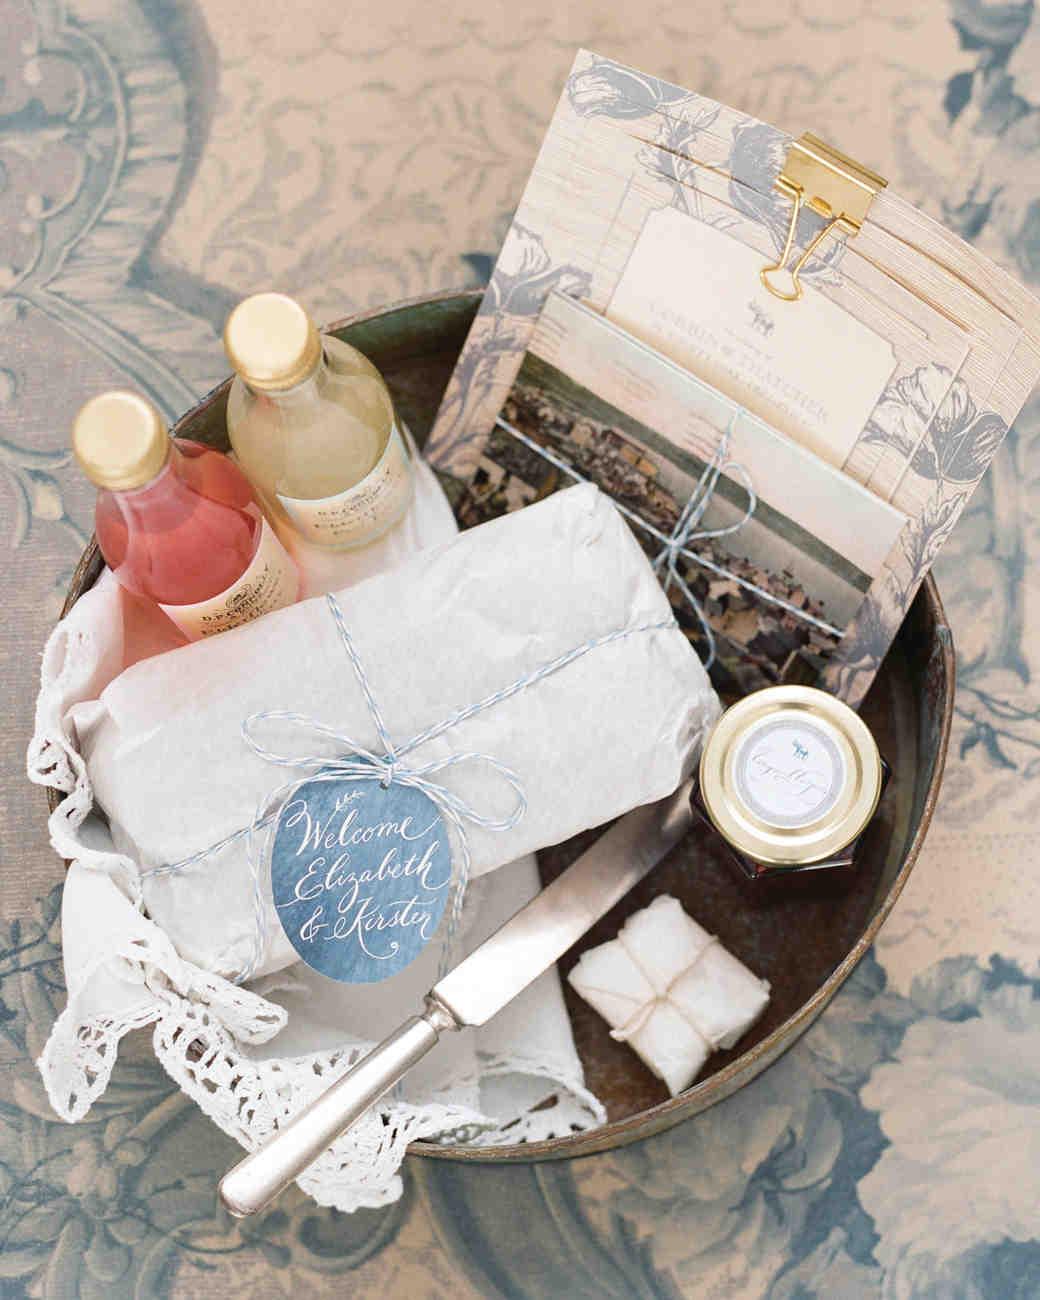 & 46 Welcome Bags from Real Weddings | Martha Stewart Weddings